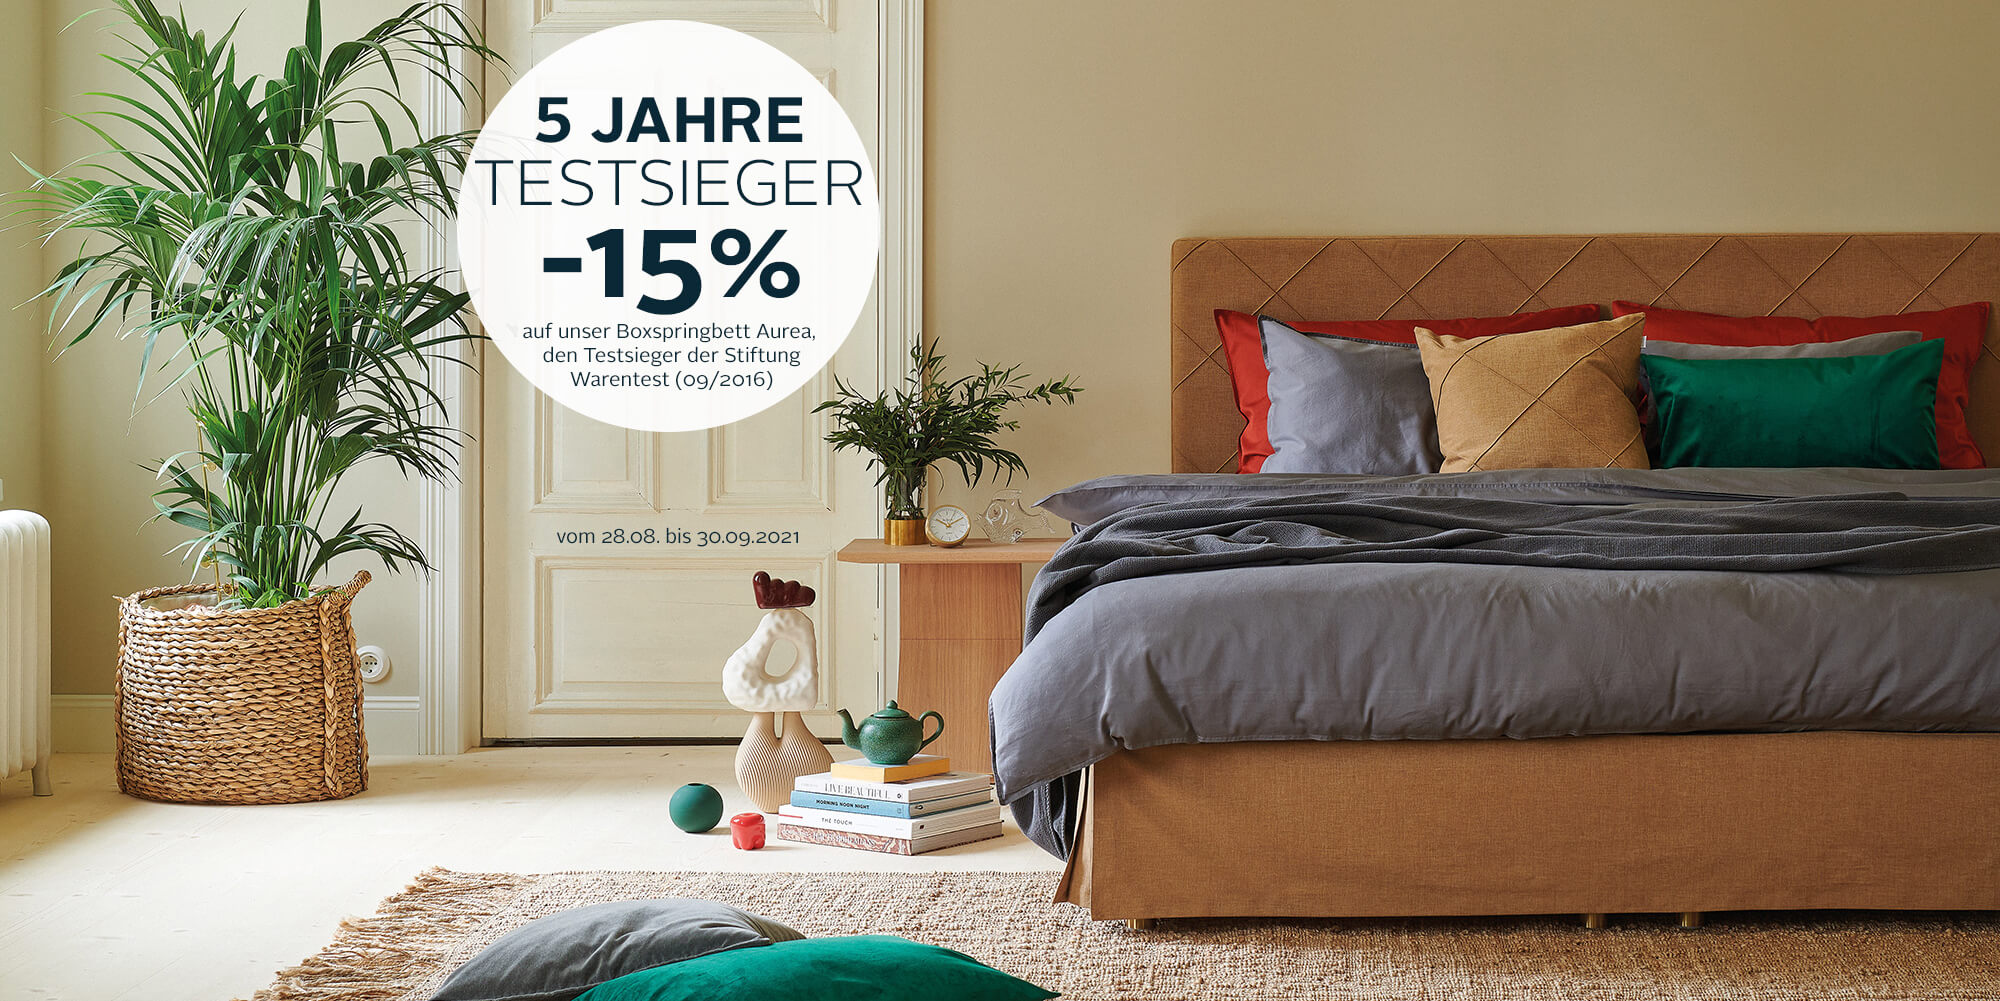 FEB-testsieger-website-2000×1200 2